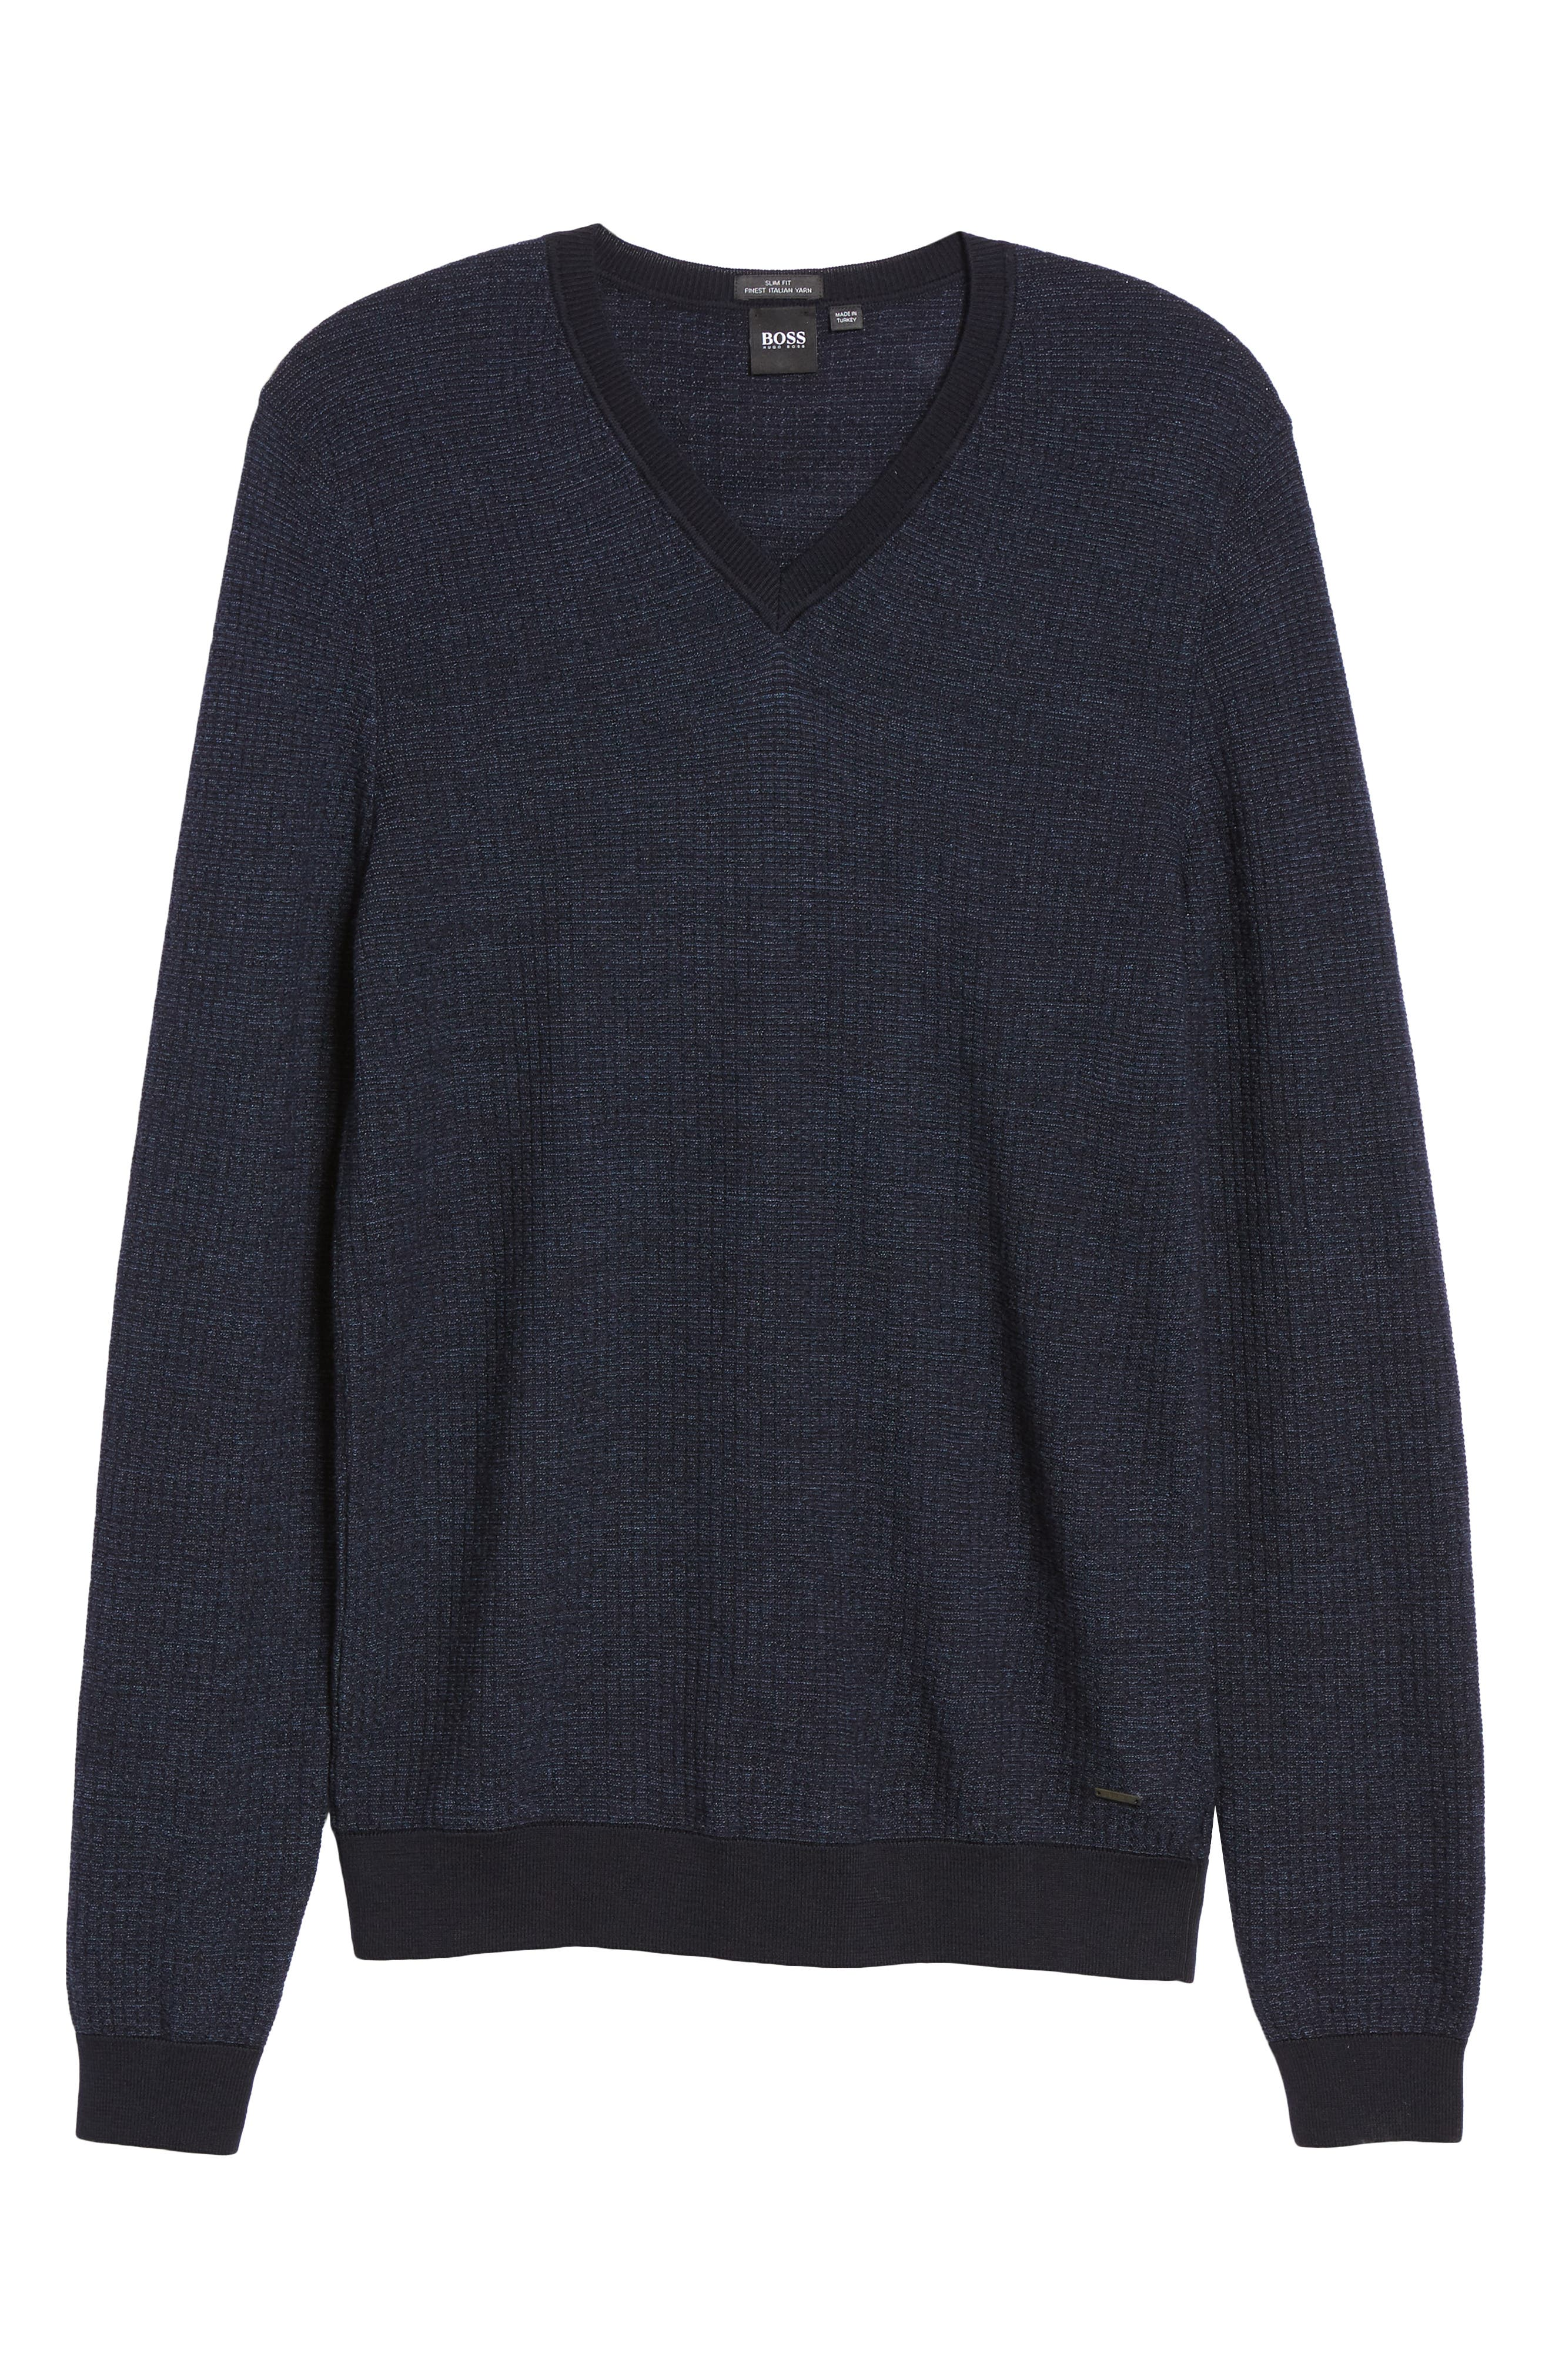 Emauro Mouline V-Neck Slim Fit Sweater,                             Alternate thumbnail 6, color,                             BLUE